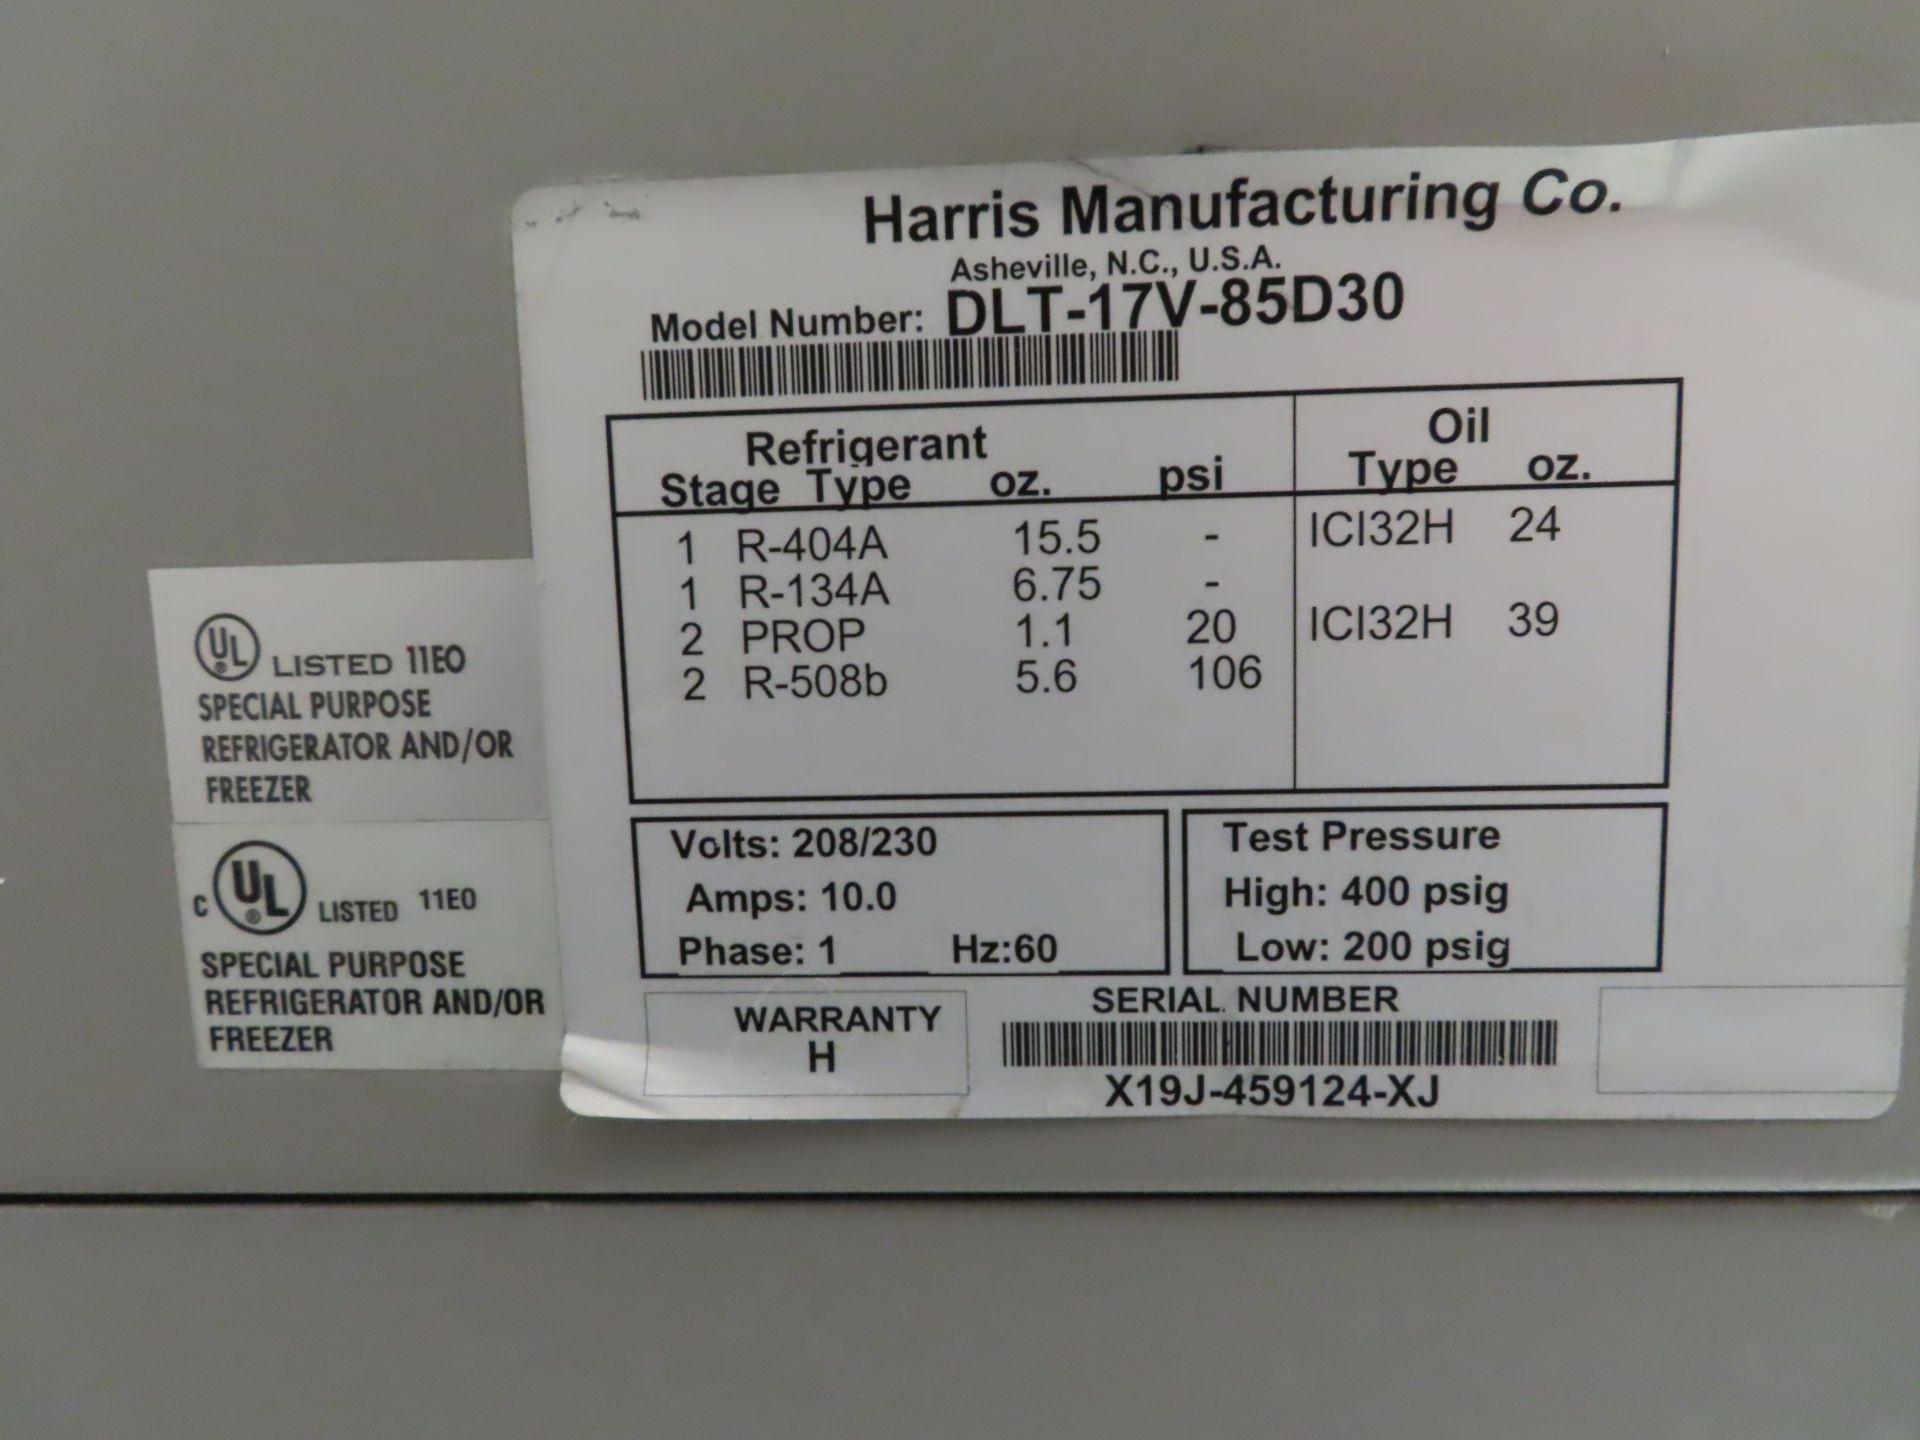 Lot 825 - Revco DLT-17V-85D30 Biomedical freezer, s/n X19J-459124-XJ, located B wing, 3rd floor, room 360A